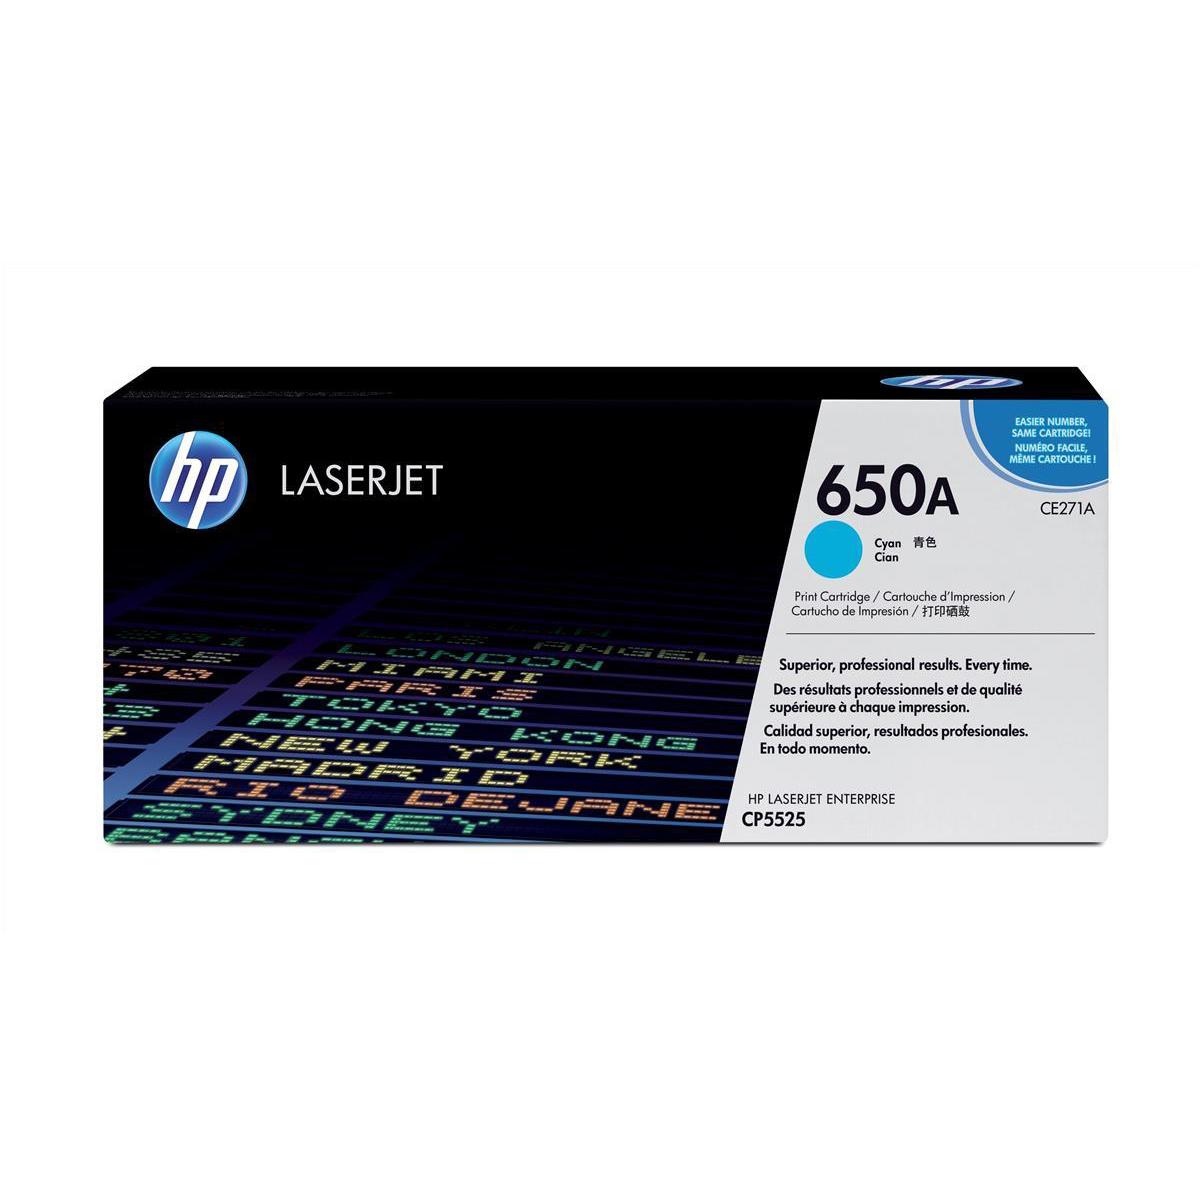 Hewlett Packard [HP] No. 650A Laser Toner Cartridge Page Life 15000pp Cyan Ref CE271A